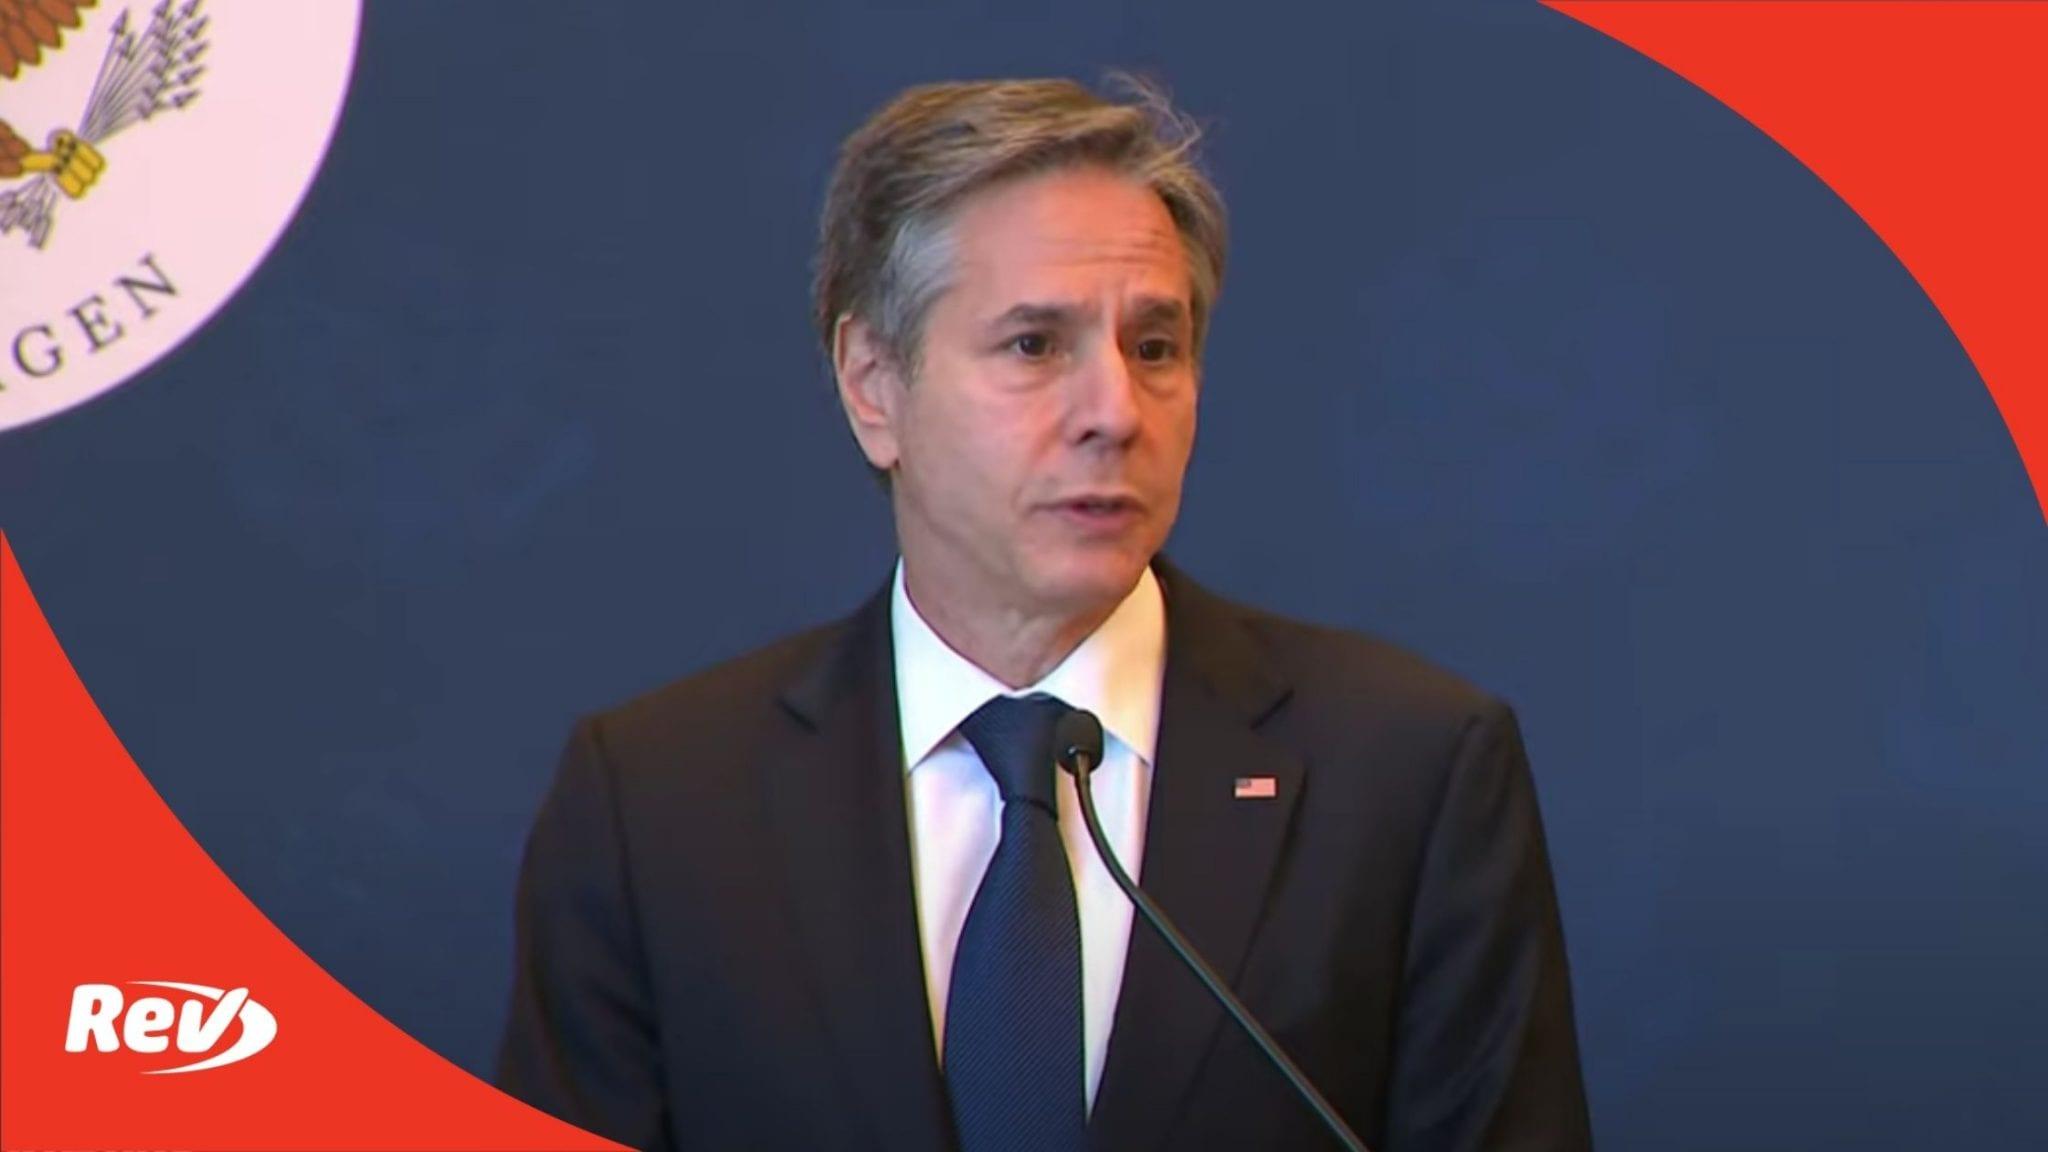 Secretary of State Antony Blinken Denmark Visit Speech Transcript May 17